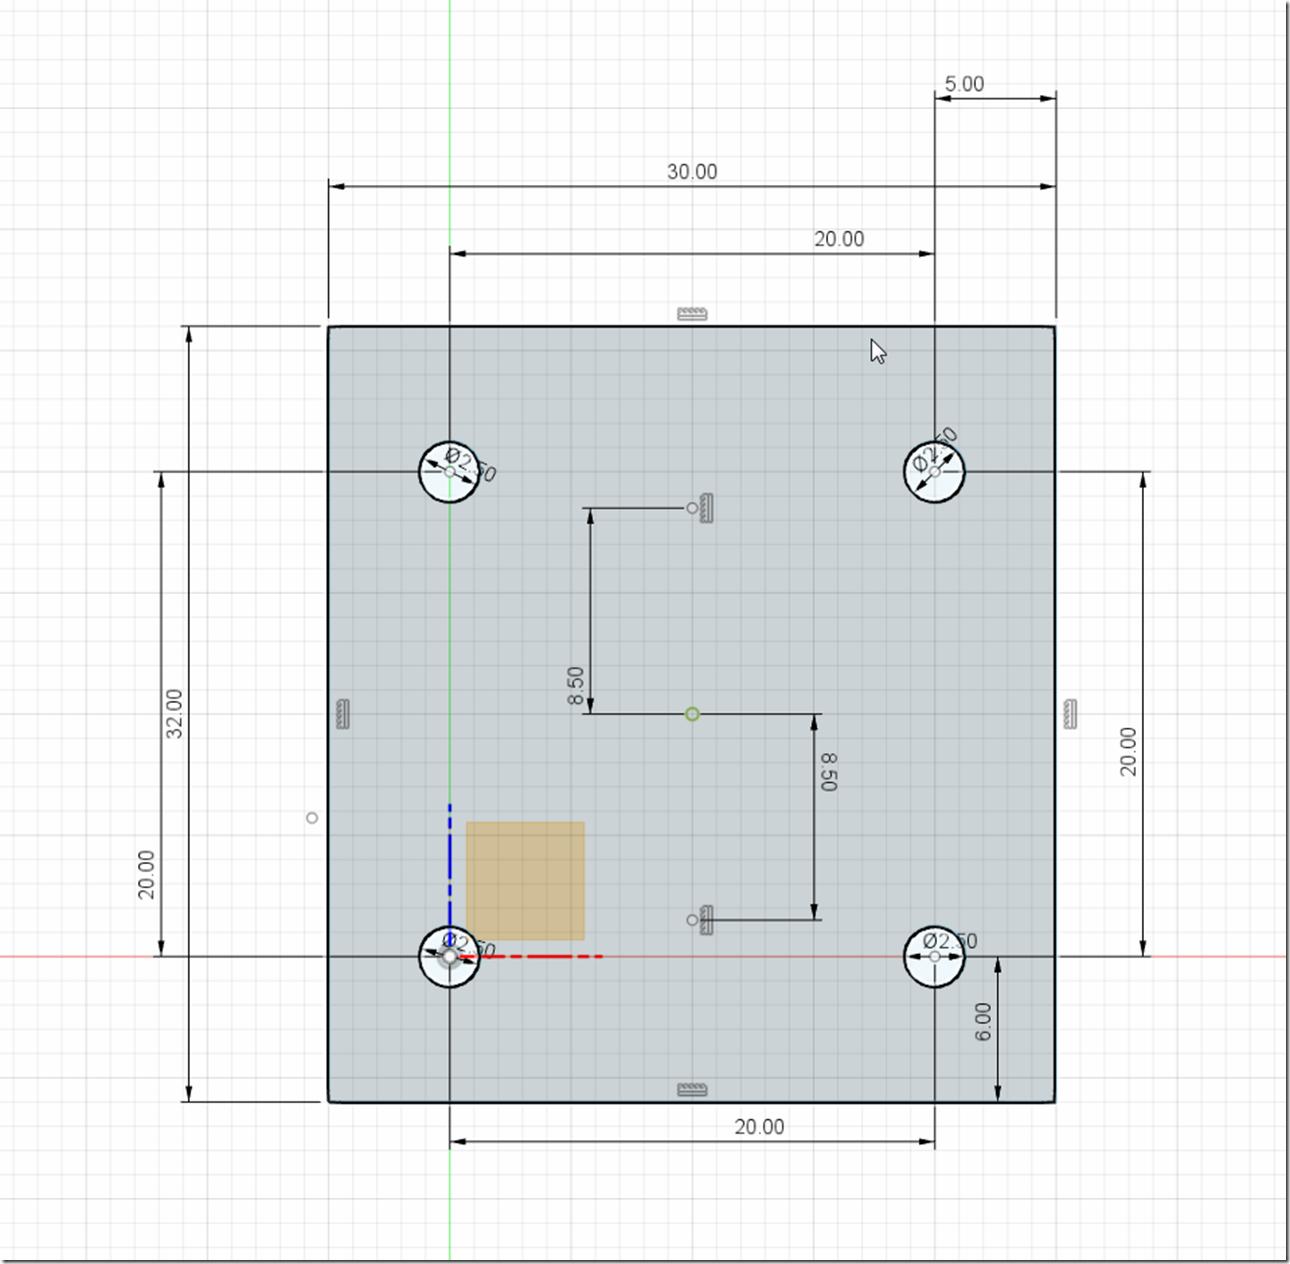 2020-06-06 19_33_46-Autodesk Fusion 360